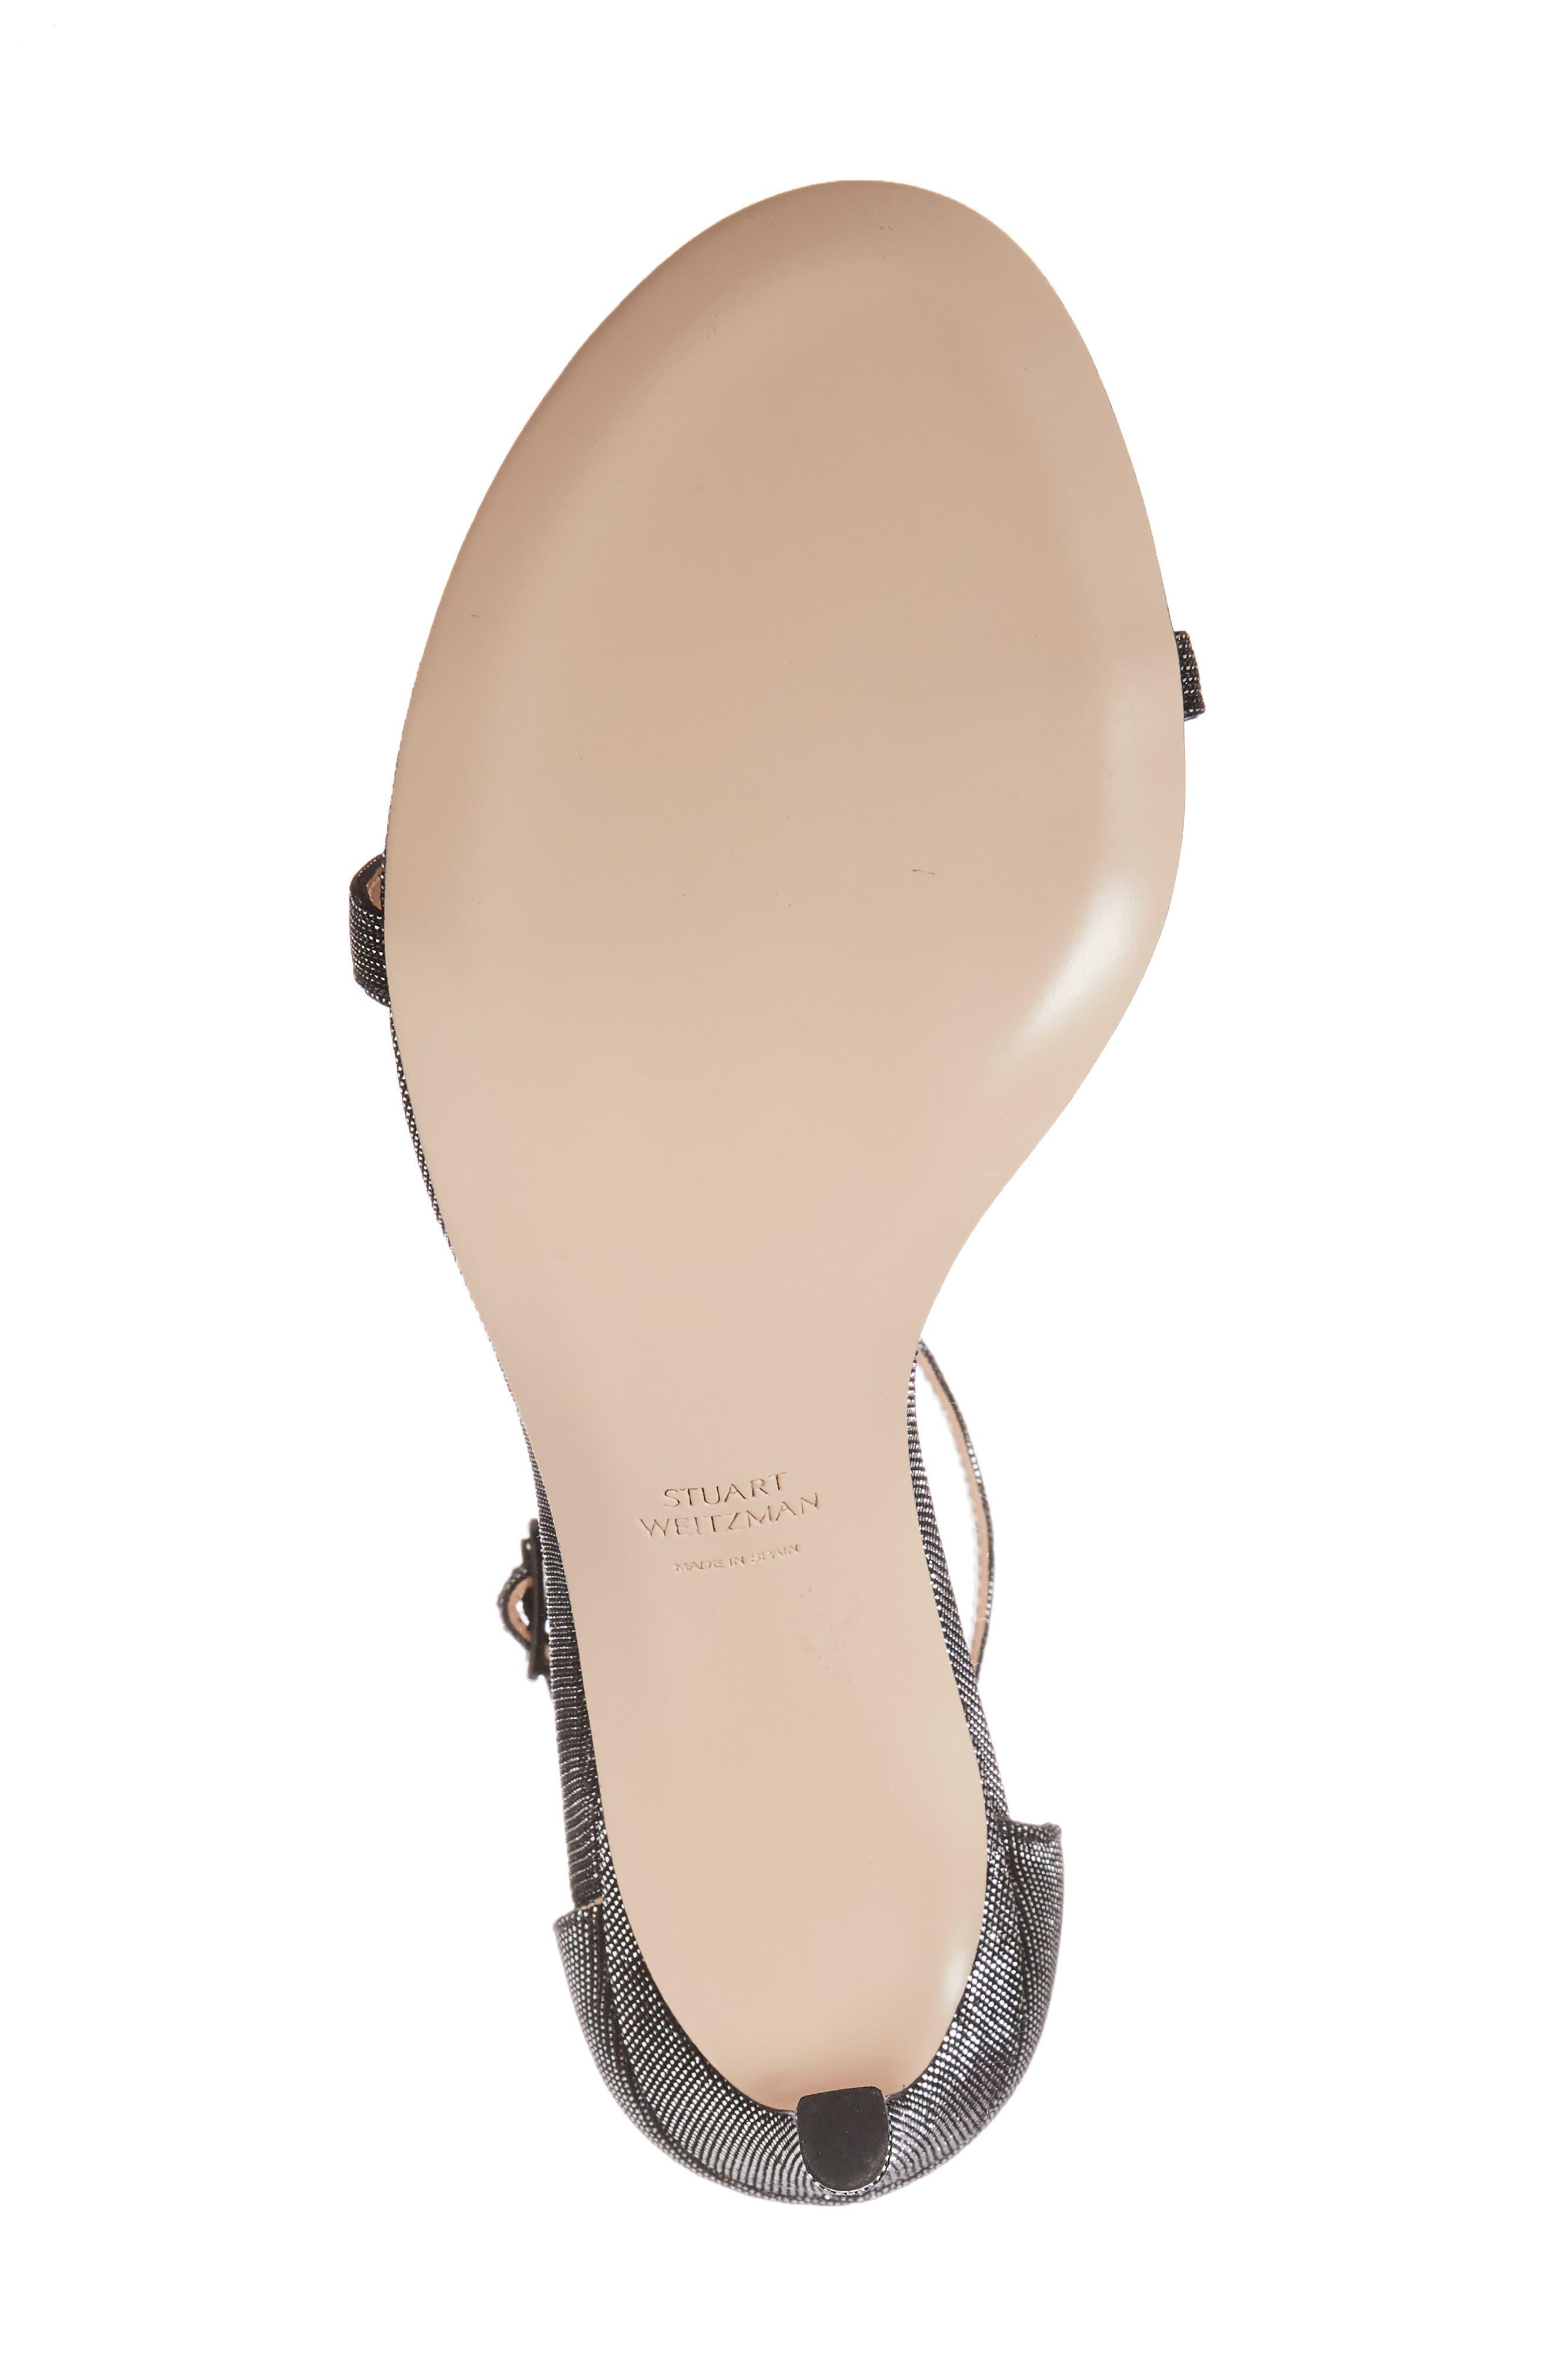 Nudistsong Ankle Strap Sandal,                             Alternate thumbnail 211, color,